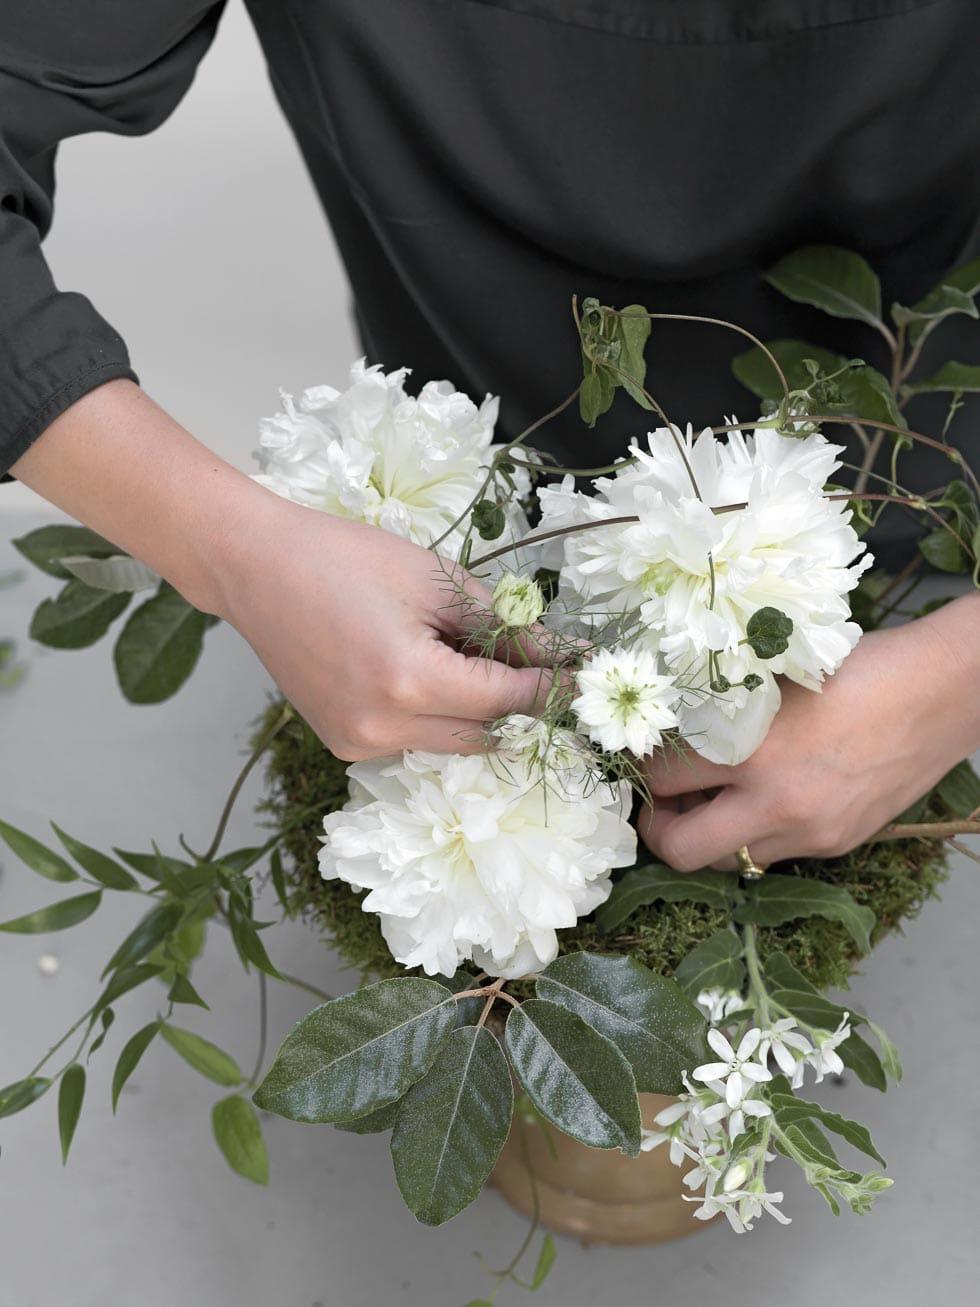 Anleitung Blumengesteck